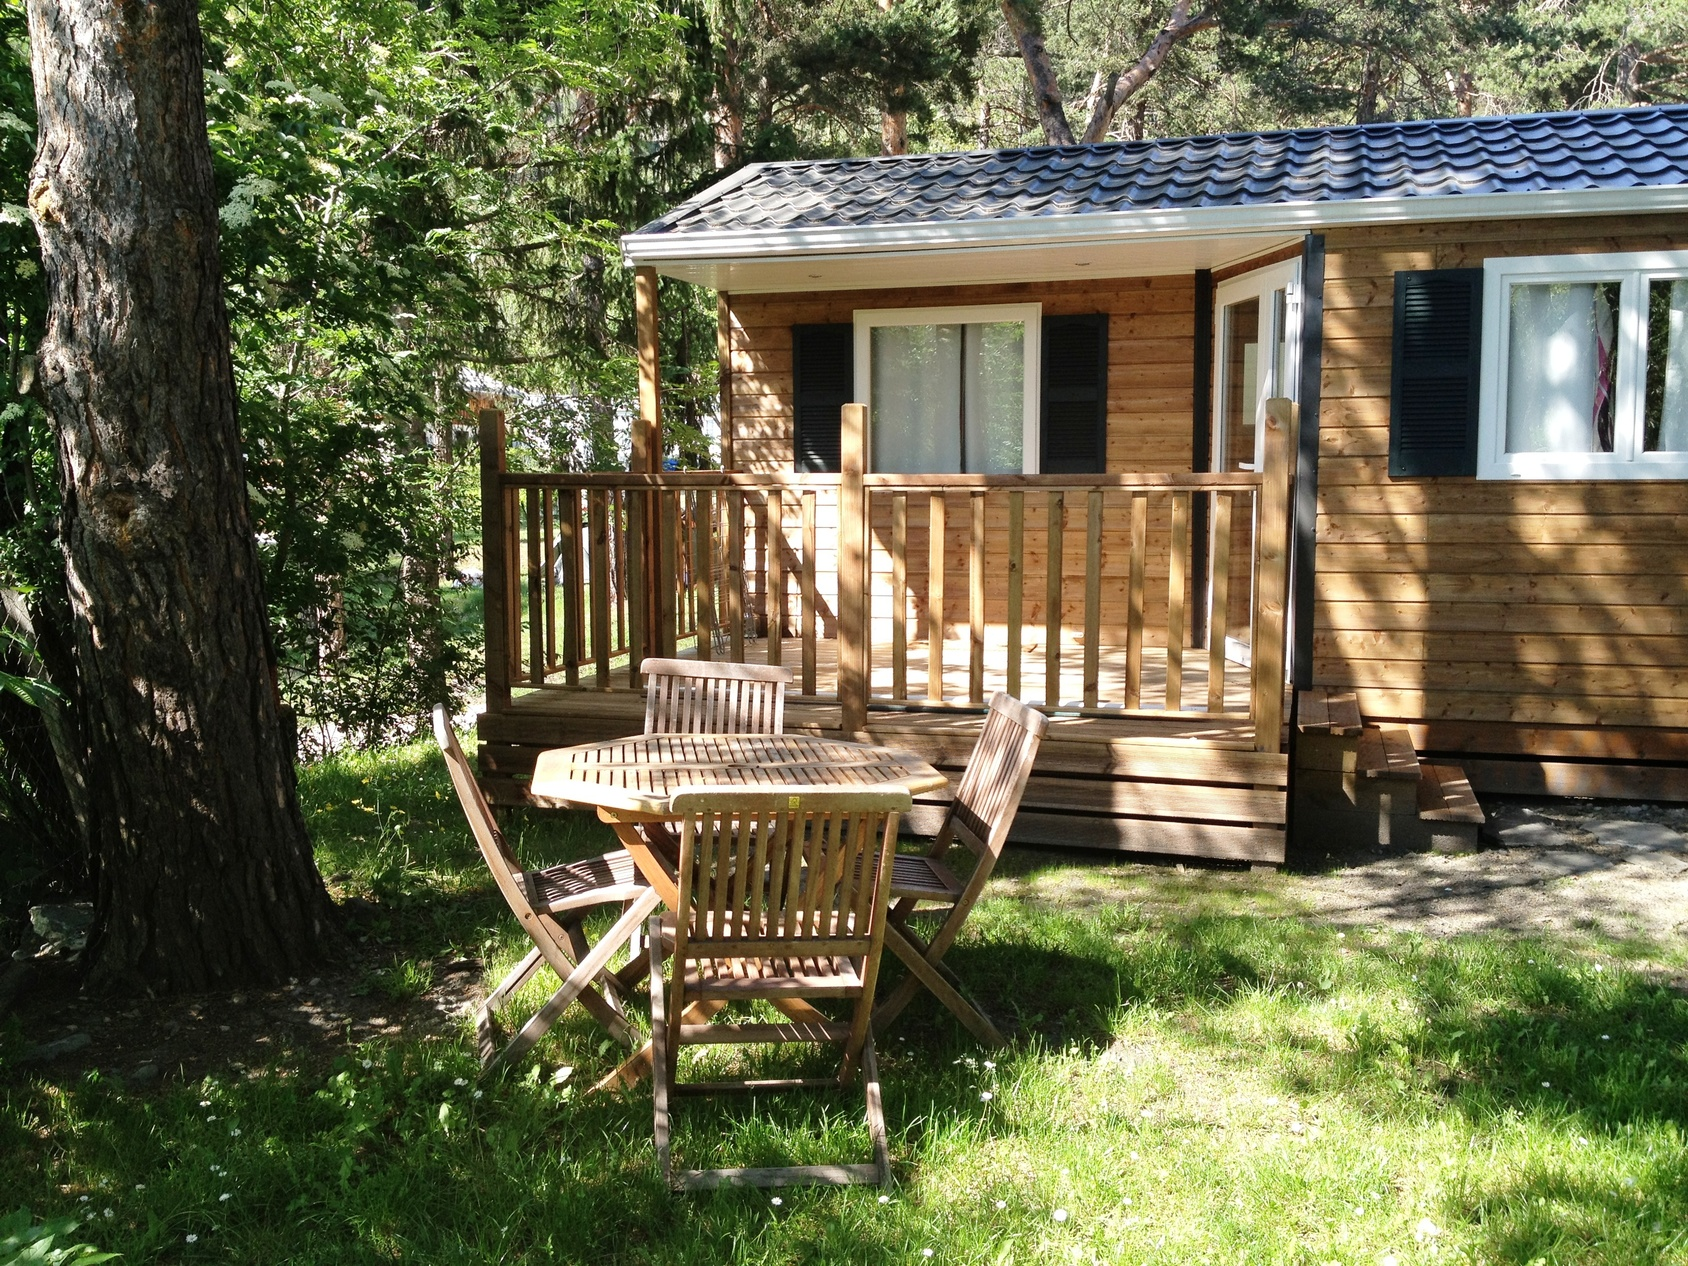 Frankrijk-Seez-Camping%20Le%20Reclus-ExtraLarge Wintersport Frankrijk|Pagina 4 van 55